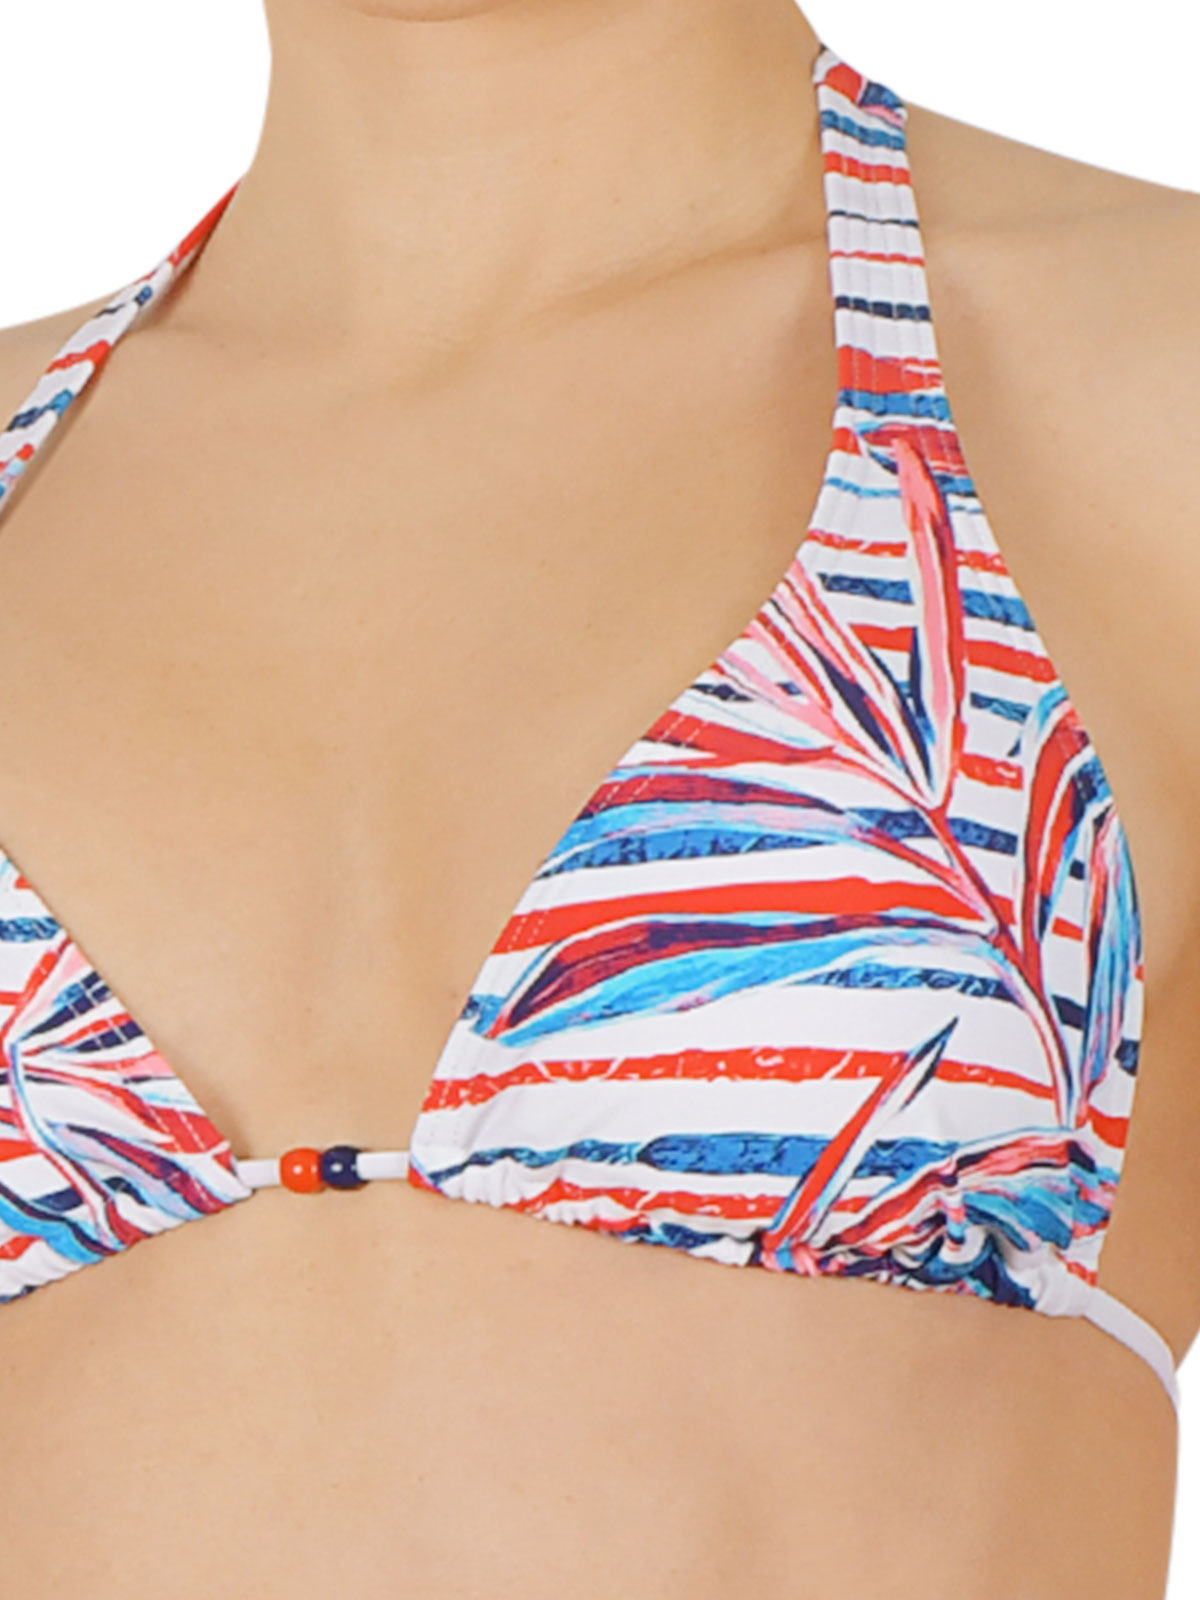 NATURANA Triangle bikini with removable pads 72524